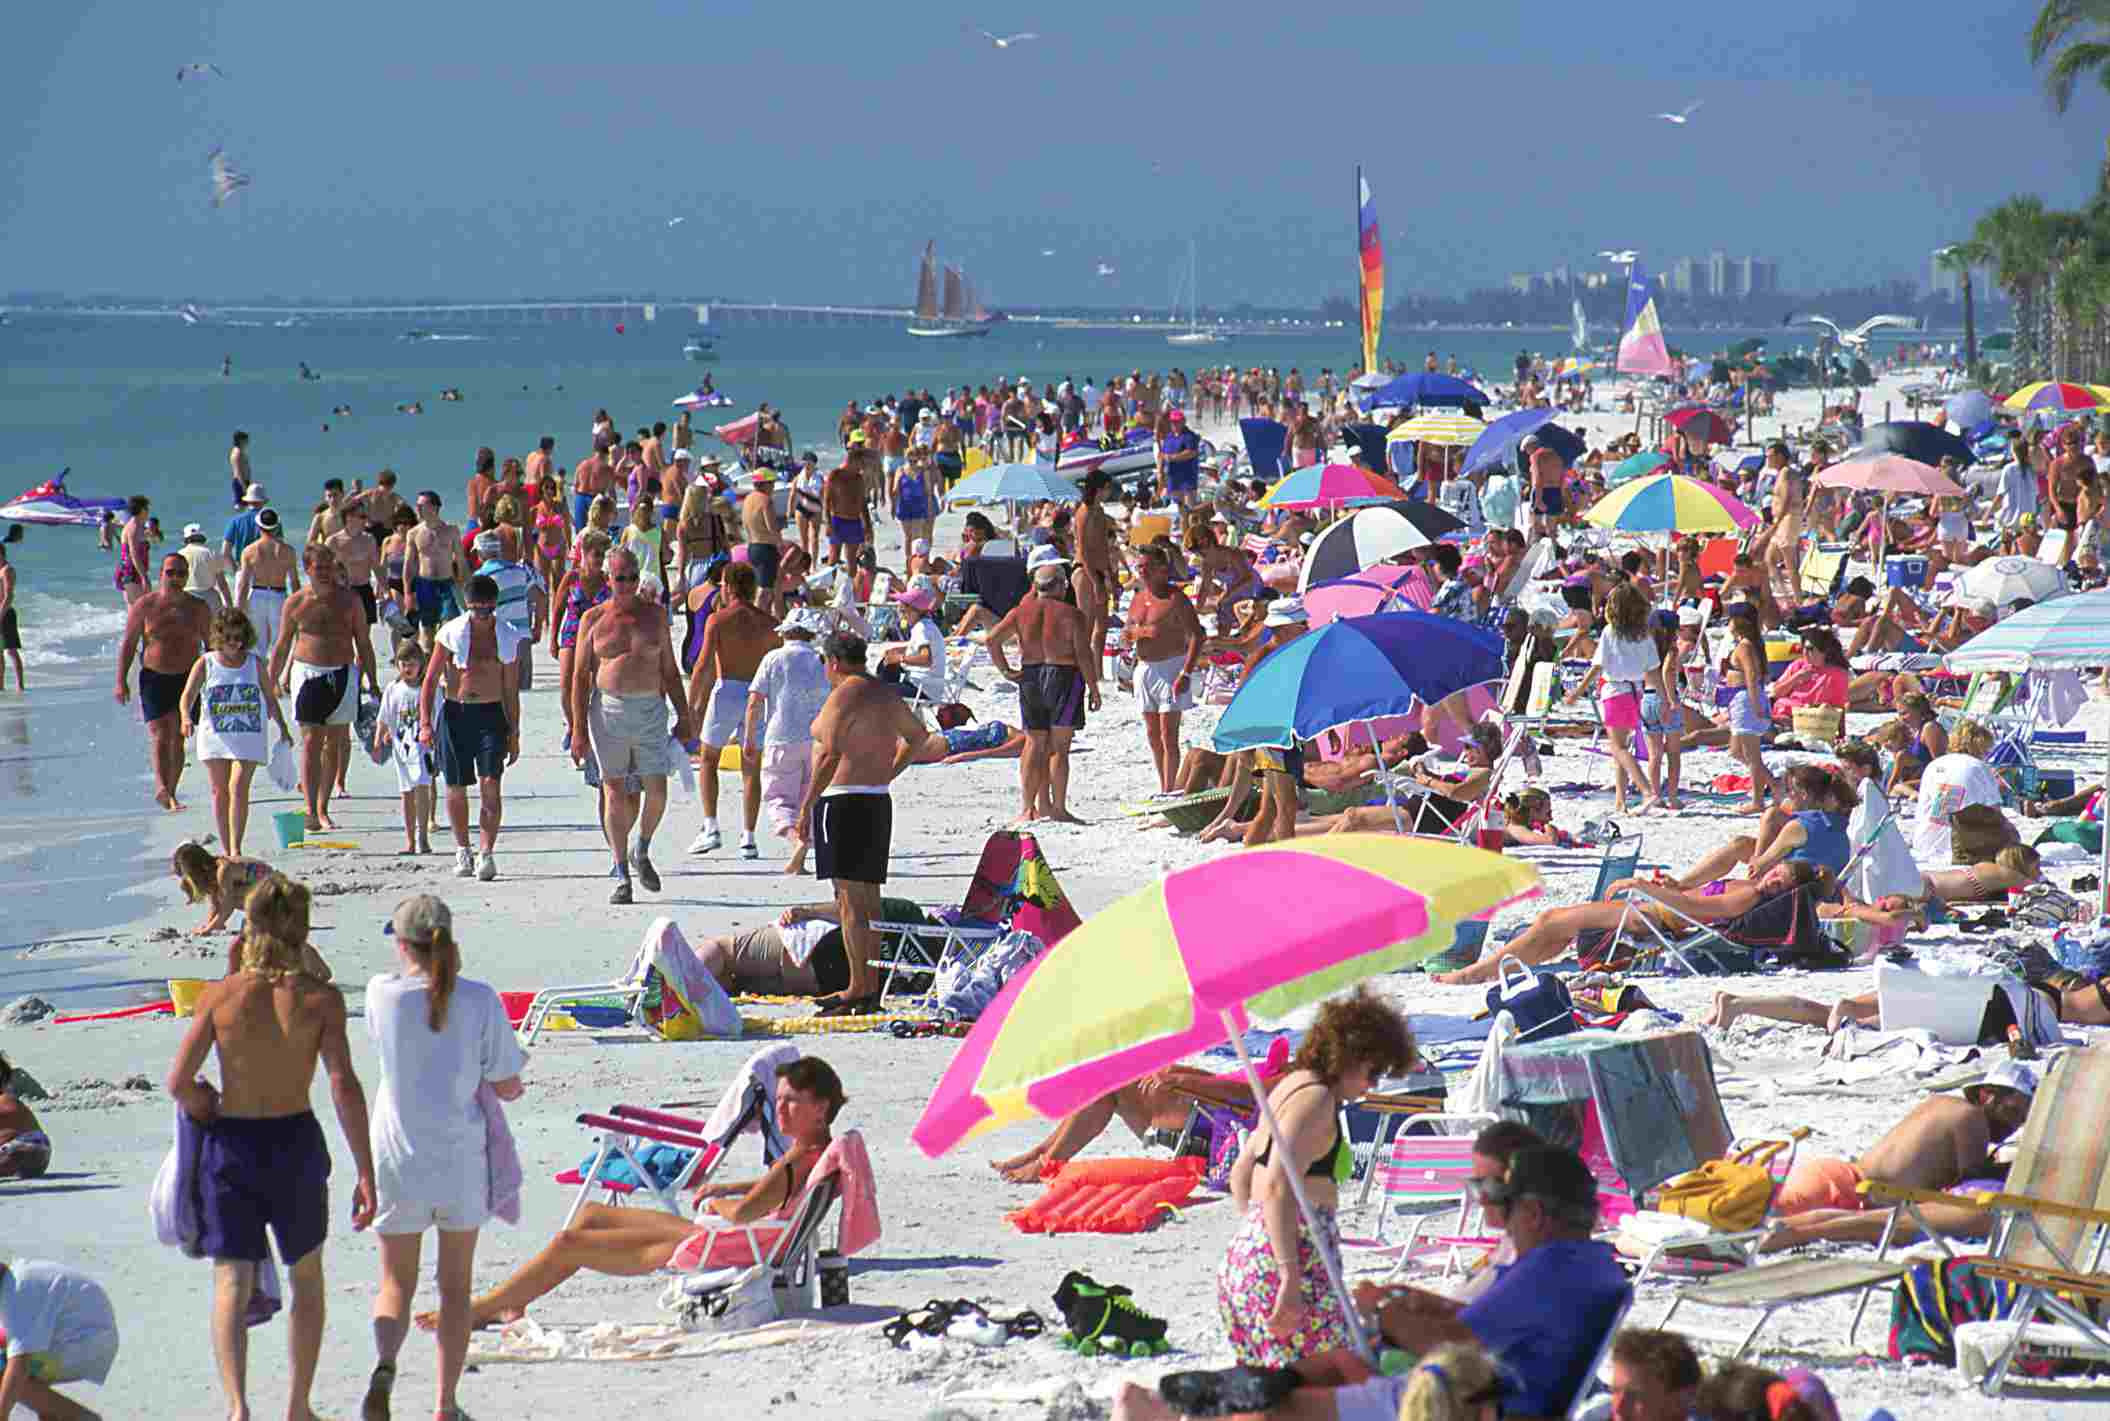 Fsu Spring Break 2020.A Crowd Free Spring Break In Florida